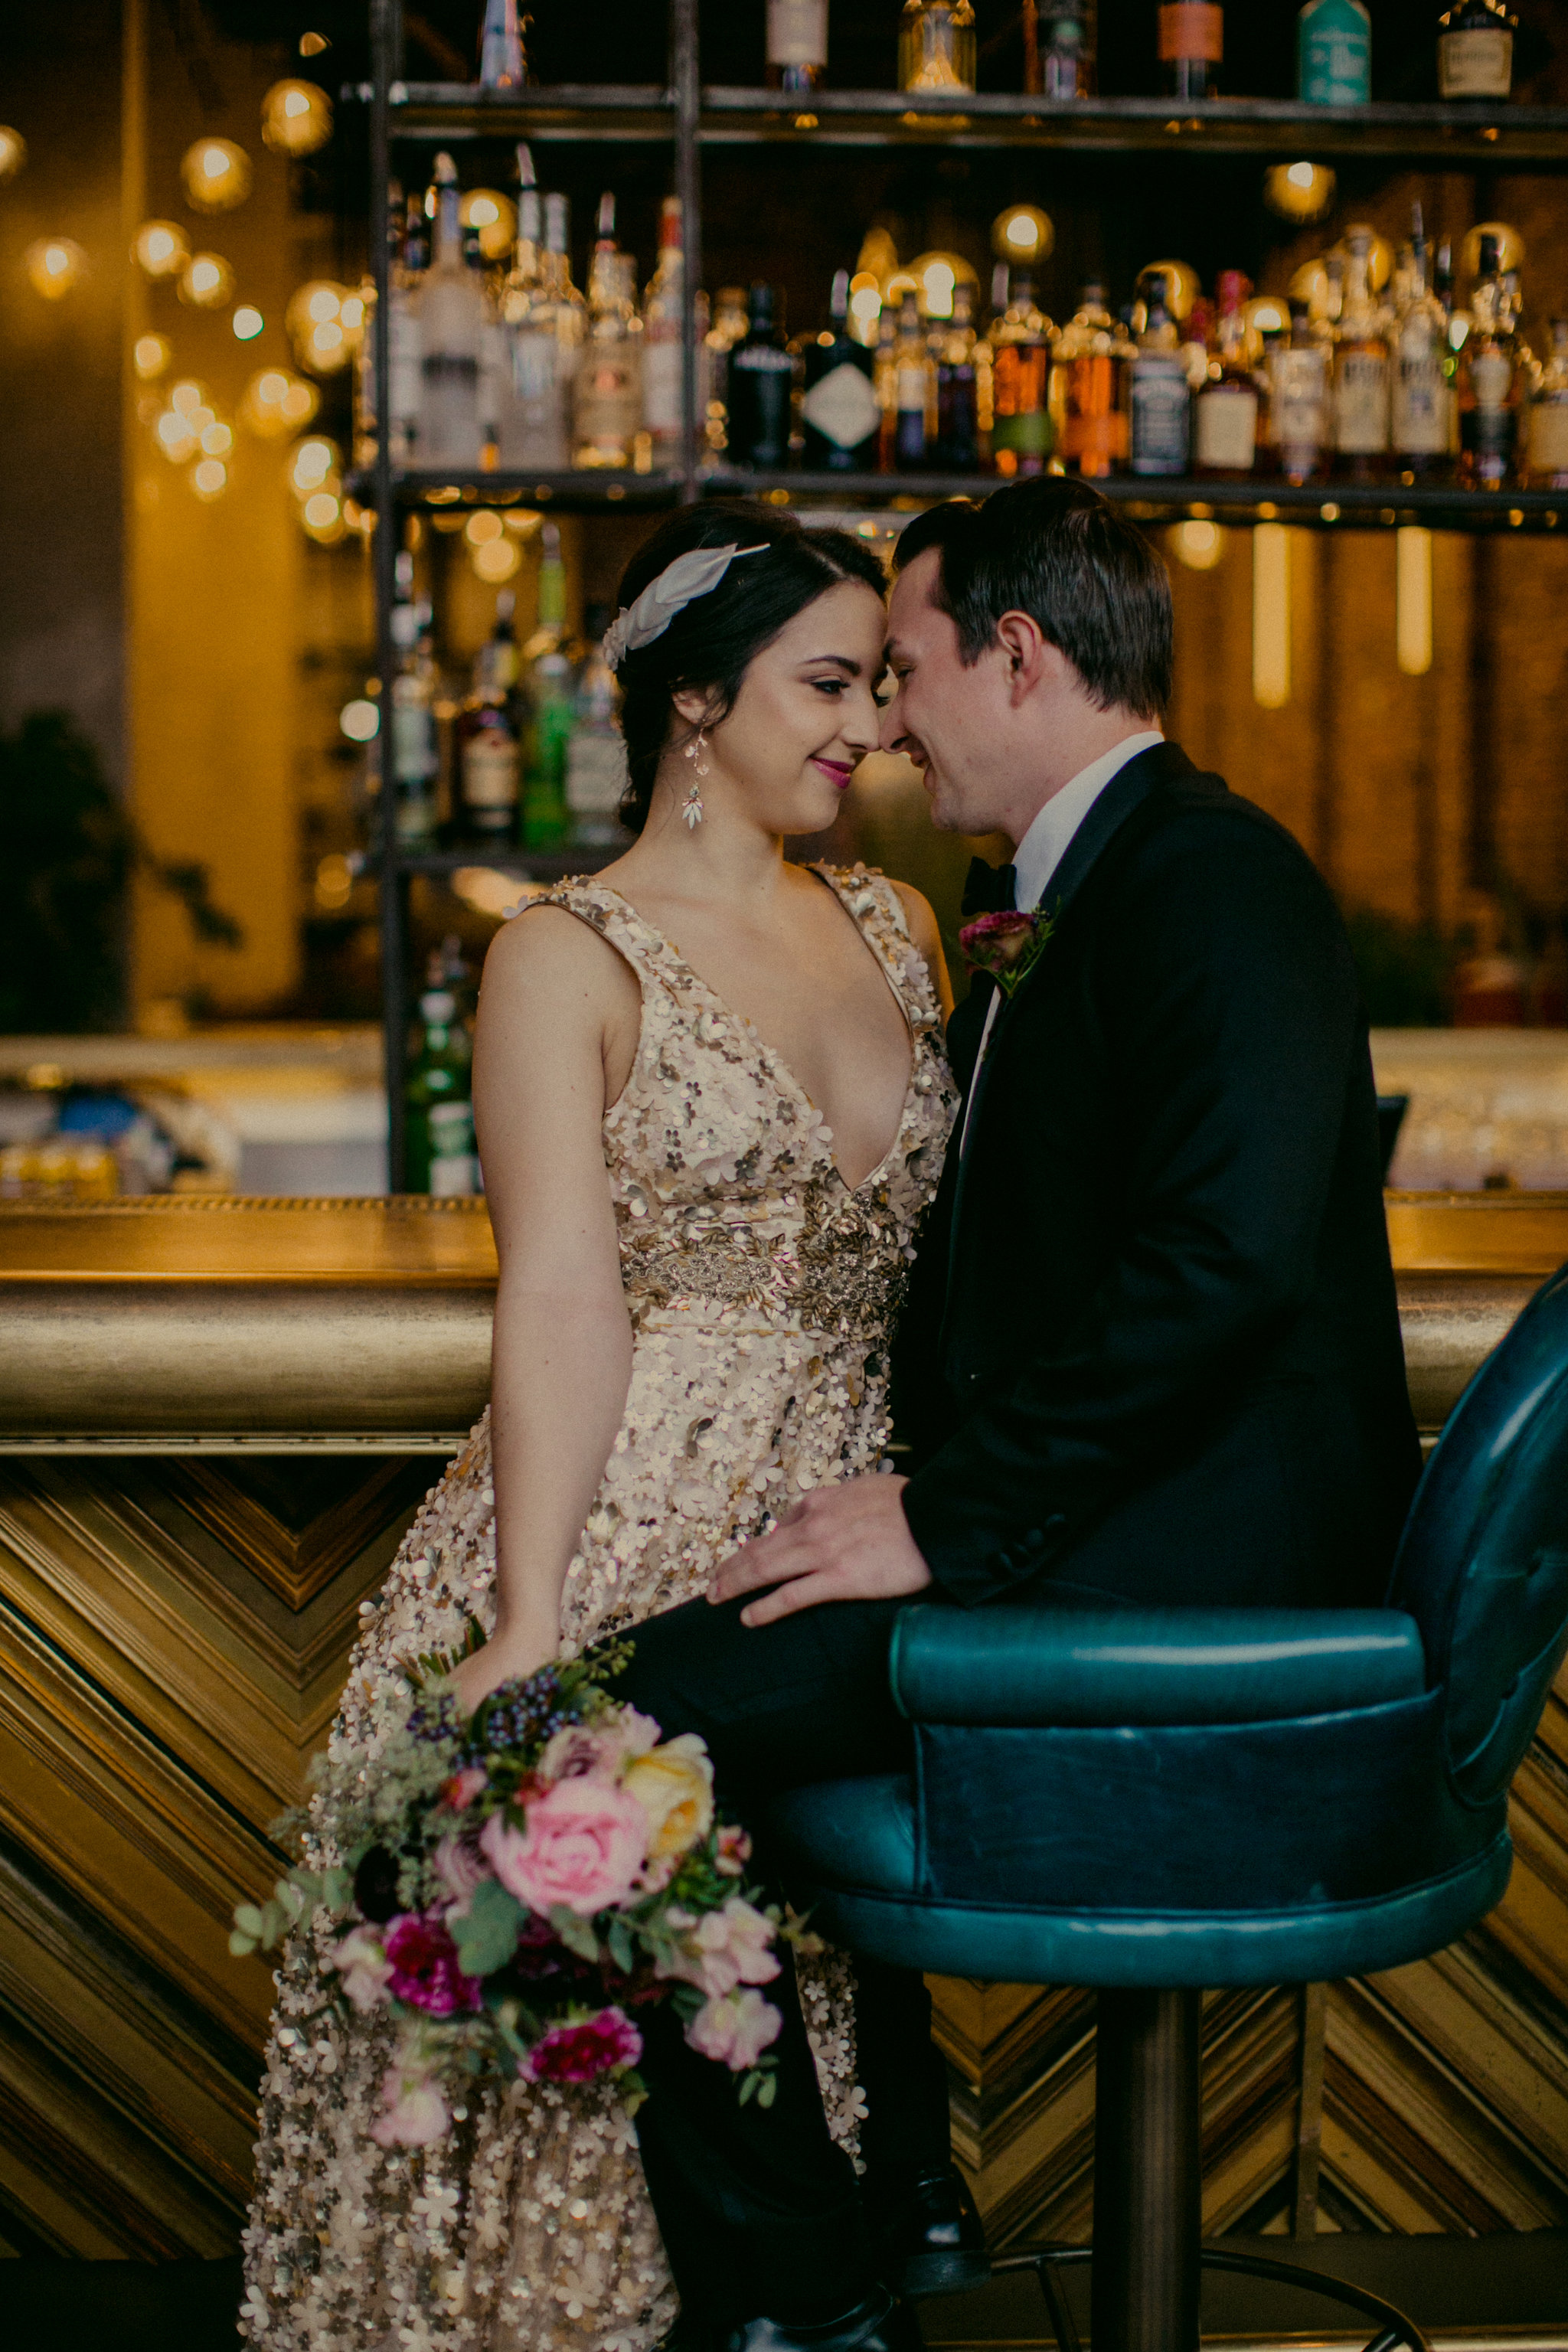 Williamsburg_Hotel_Wedding_Photographer_Chellise_Michael_Photography-159.jpg